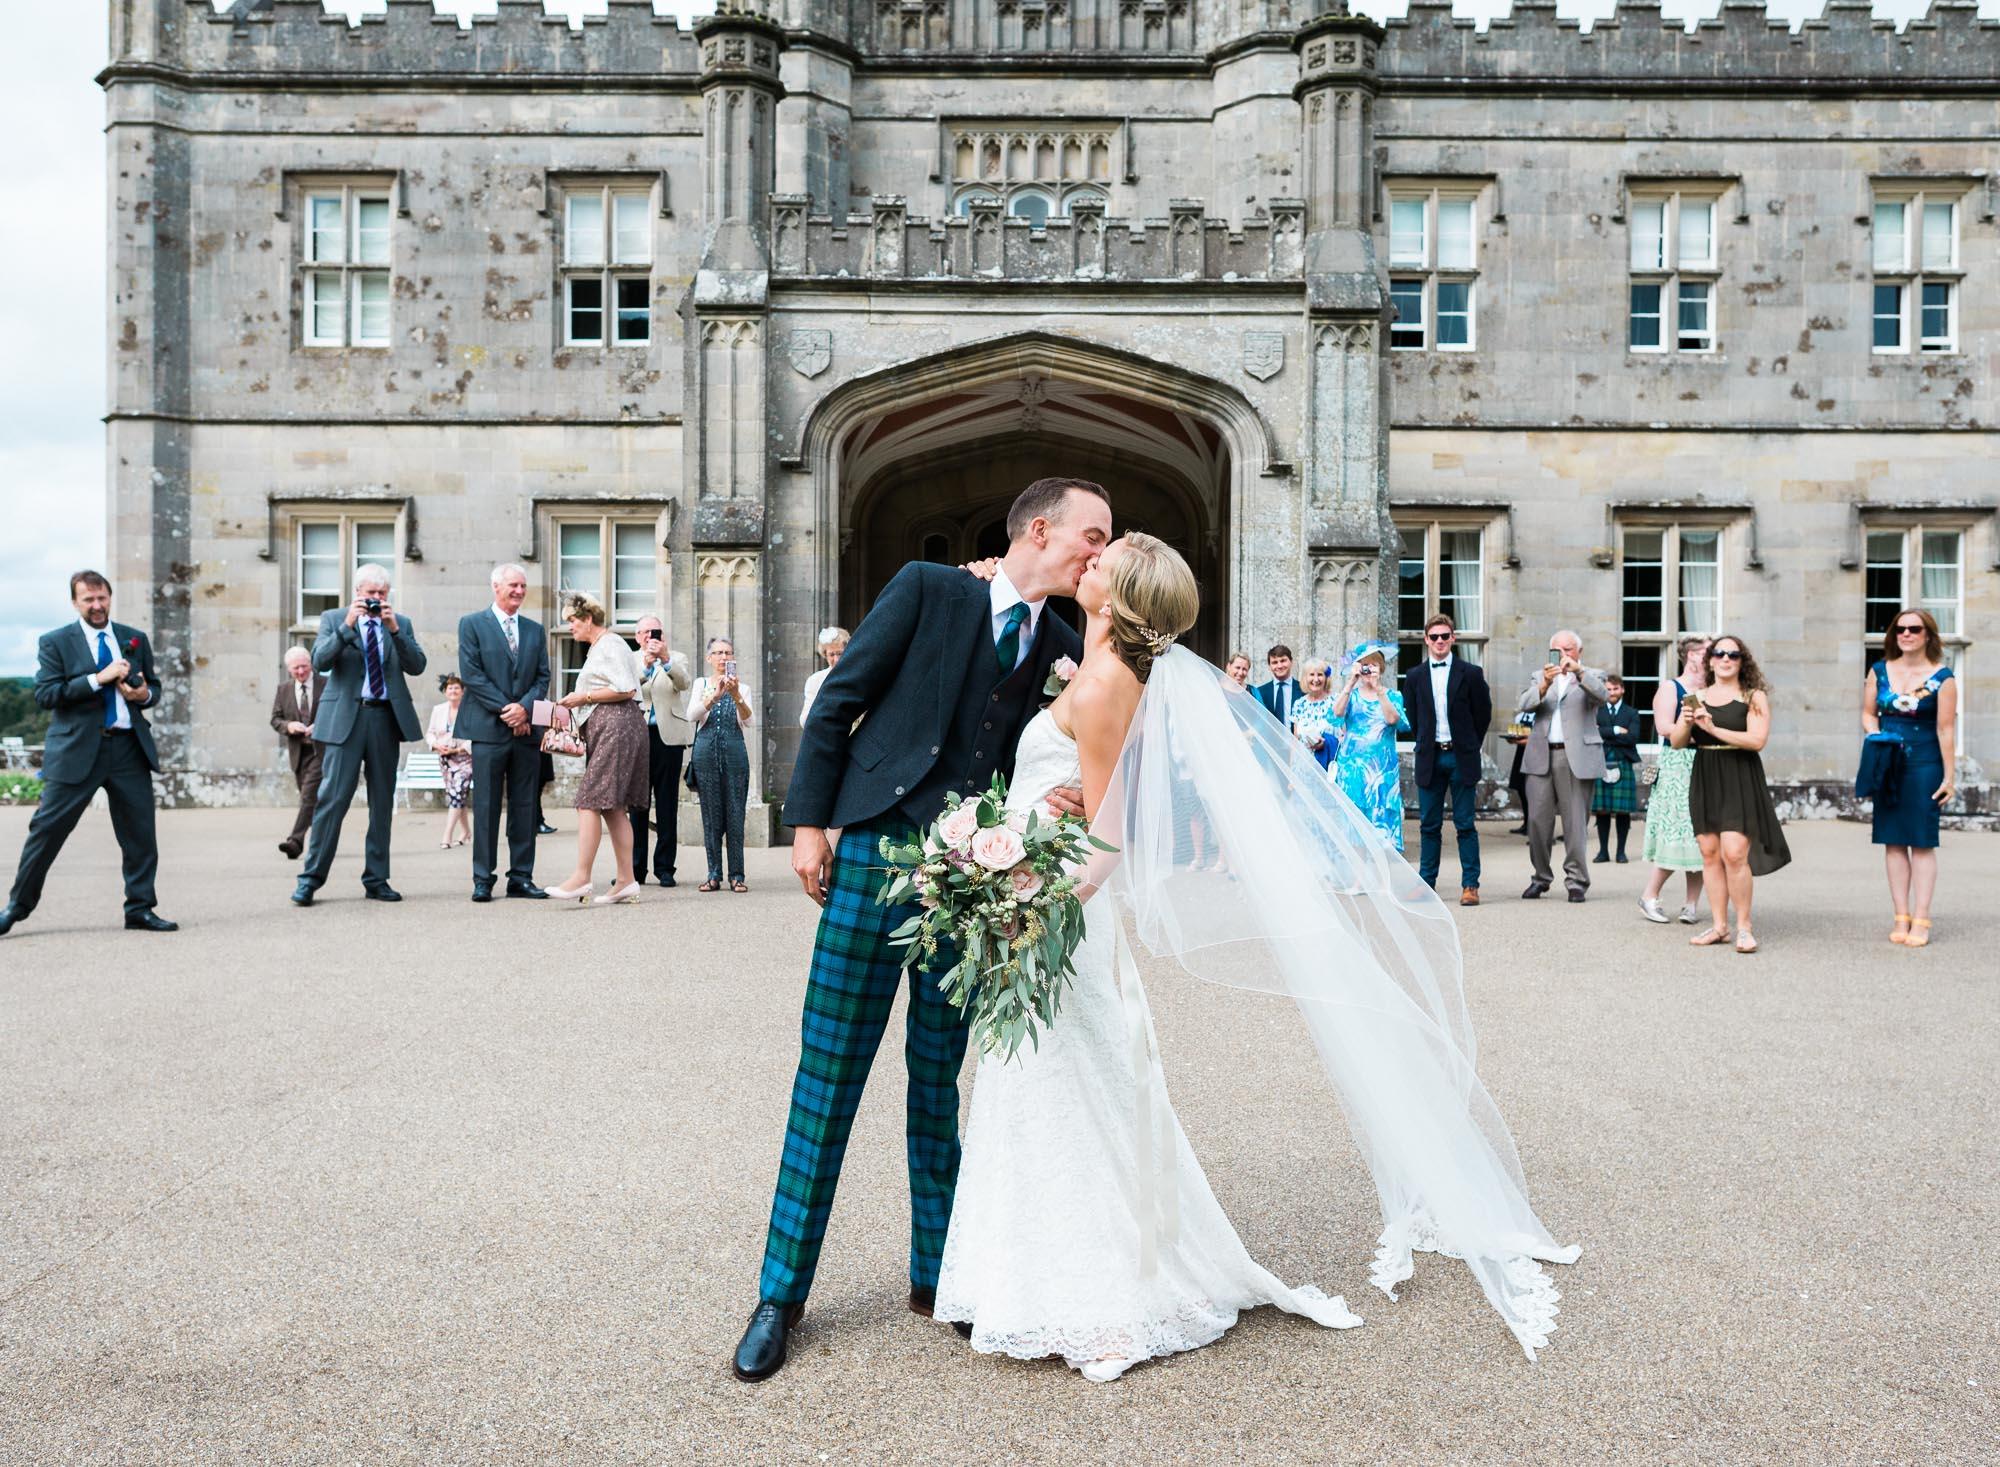 scottish_wedding_blairquhan_castle-71.jpg